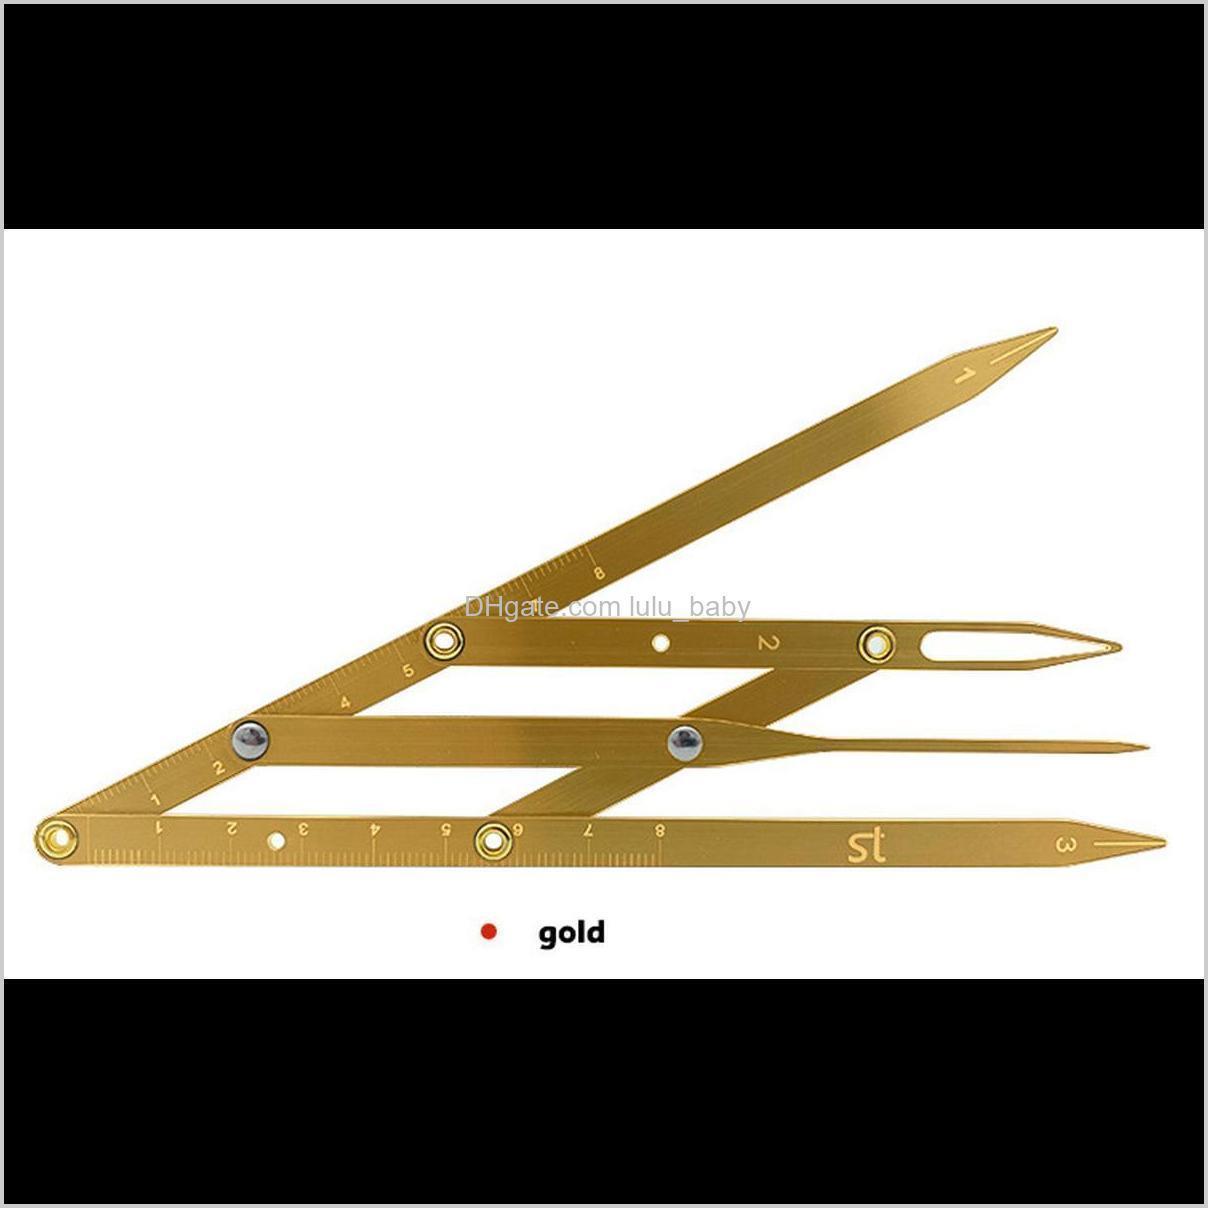 stainless steel golden ratio microblading permanent makeup eyebrow measure tool mean golden eyebrow divider